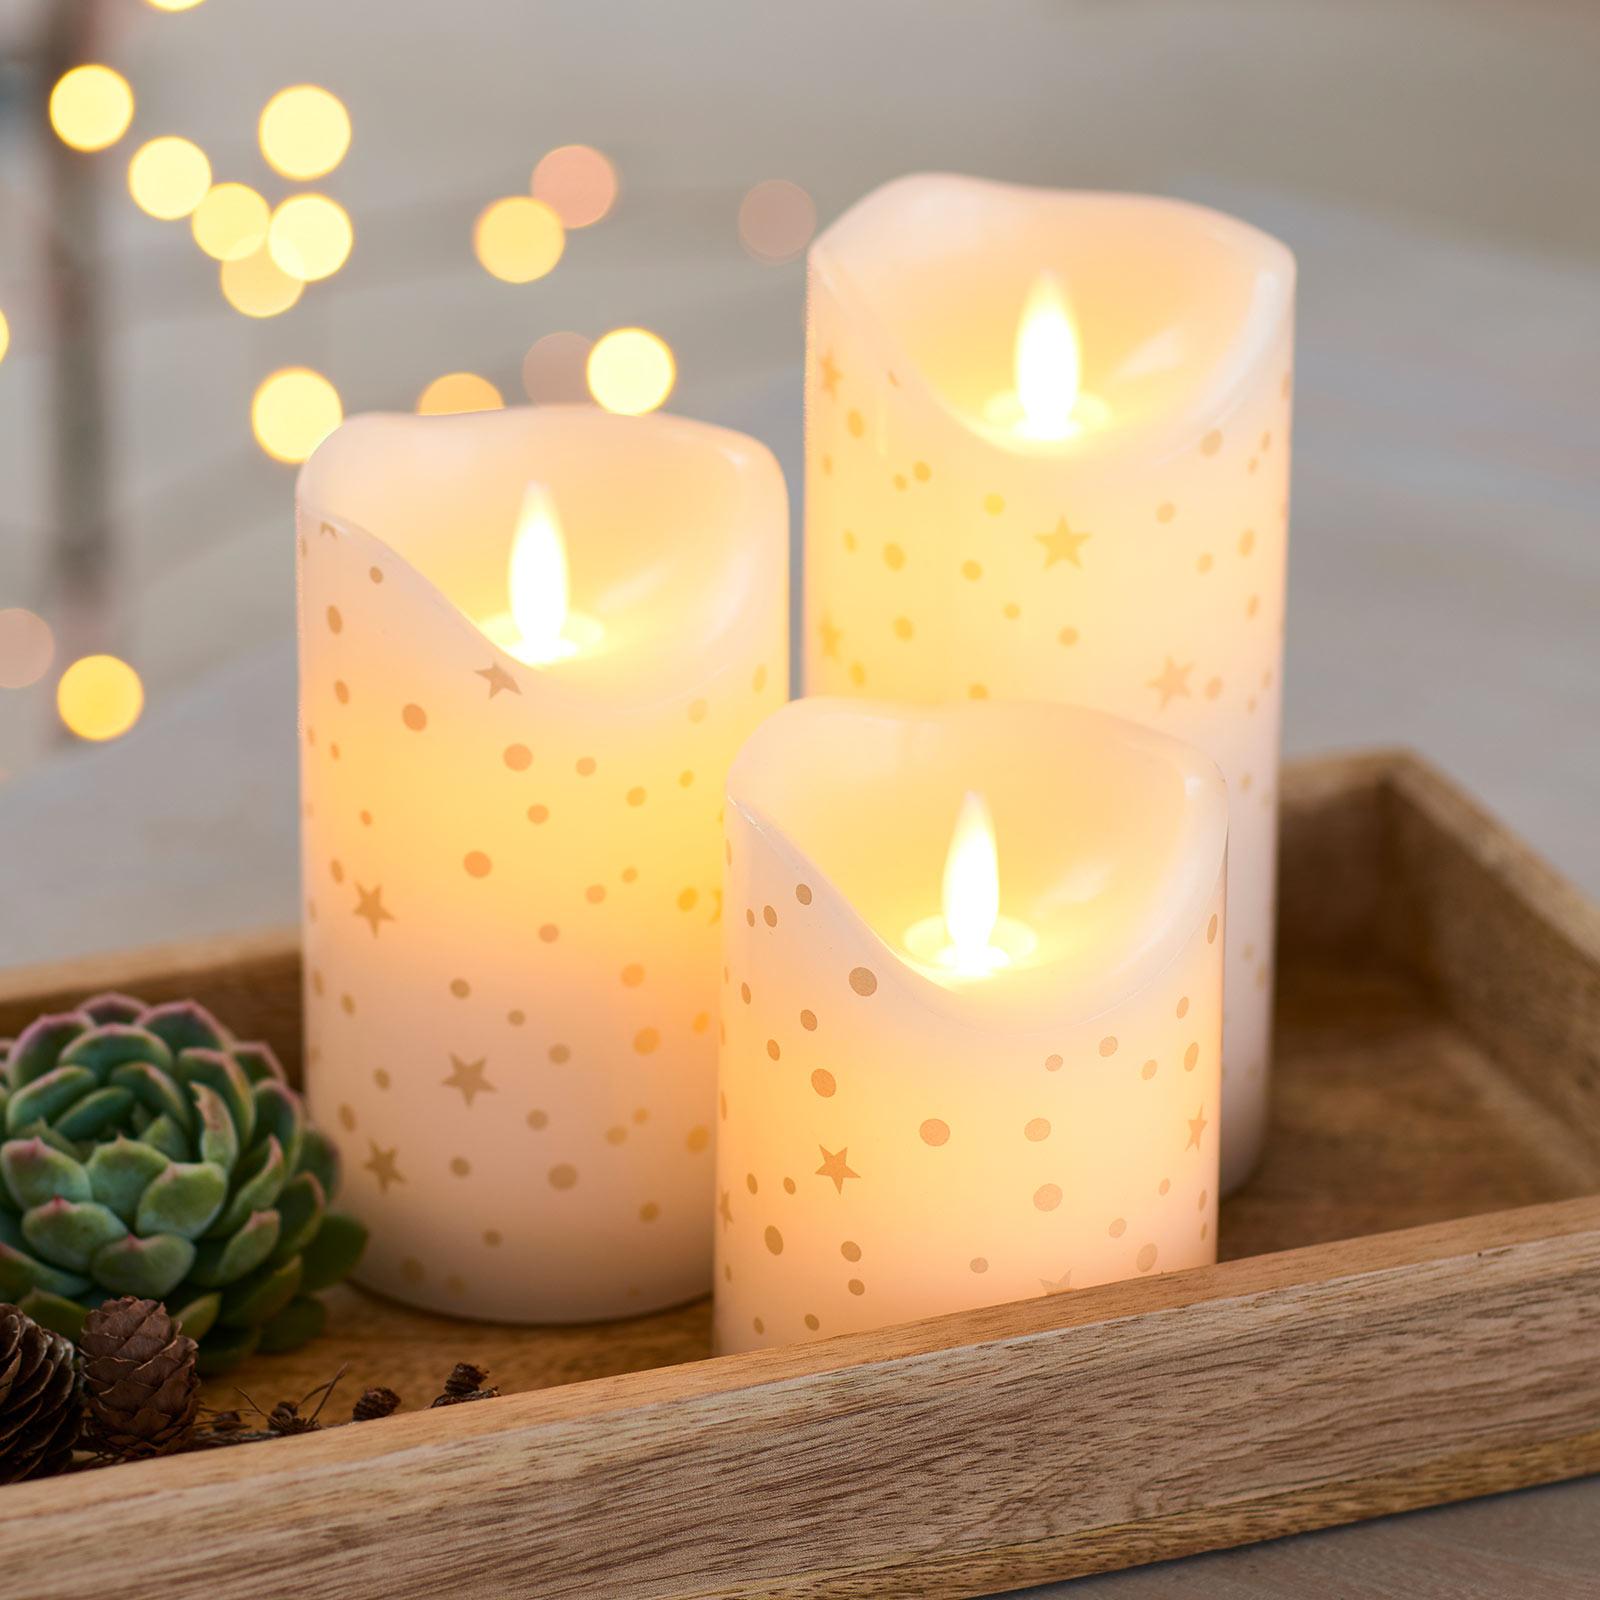 LED-Kerze Sara 3er romantic weiß/gold Höhe 10-15cm